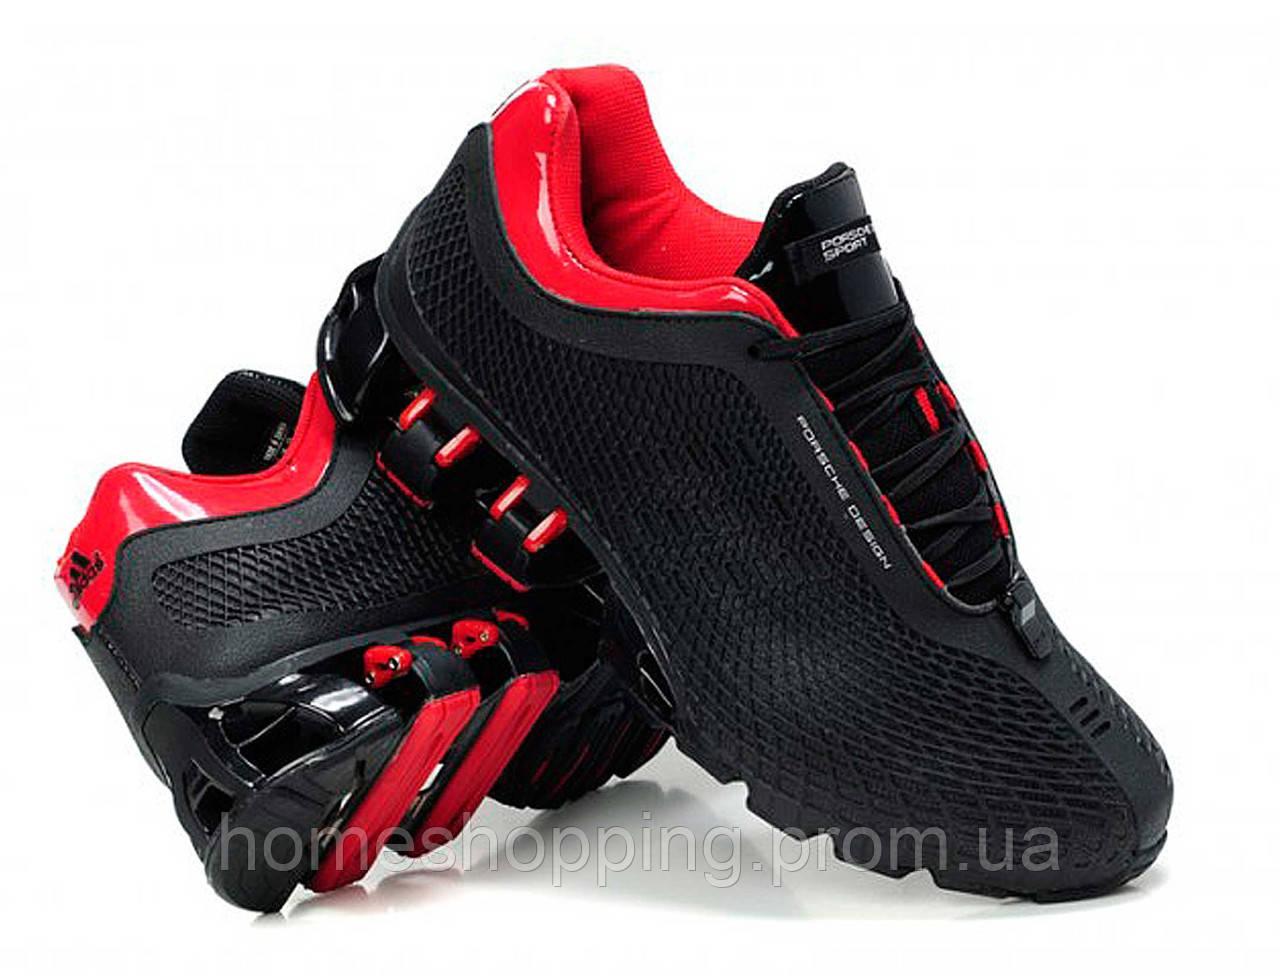 Кроссовки мужские Adidas Porsche Design P5000 Bounce S2 Black Red